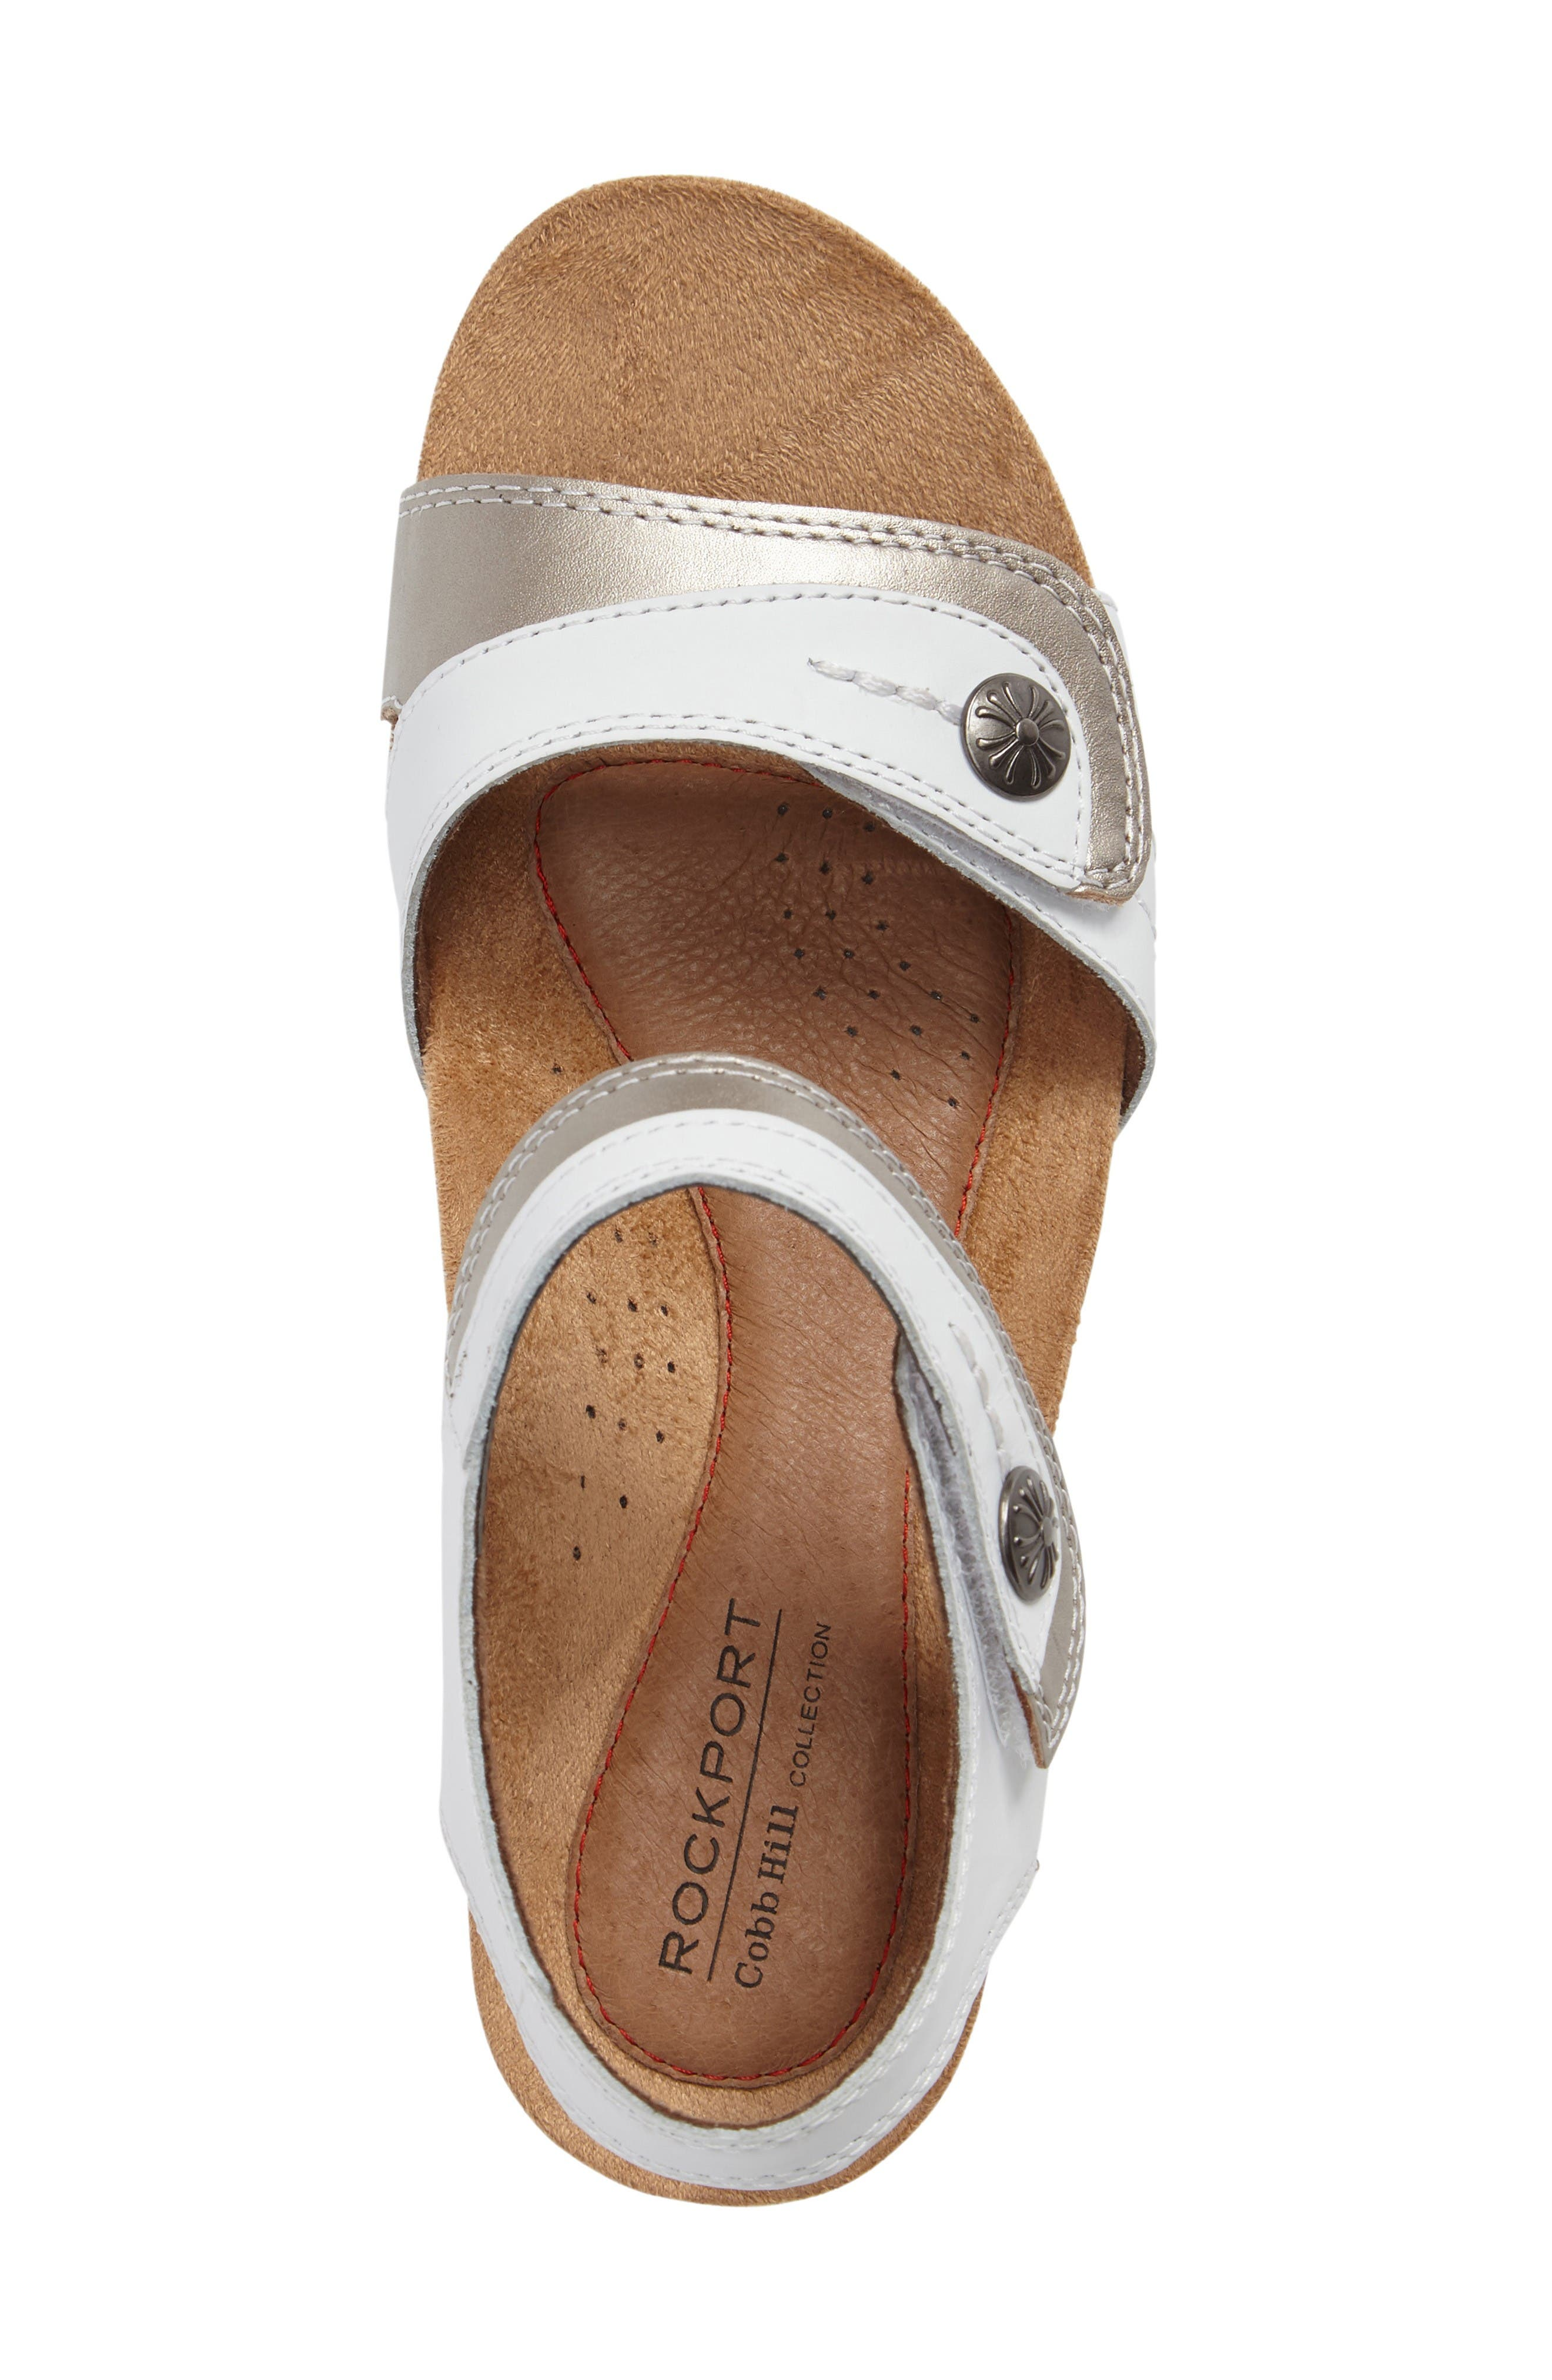 Hollywood Wedge Sandal,                             Alternate thumbnail 5, color,                             White Leather